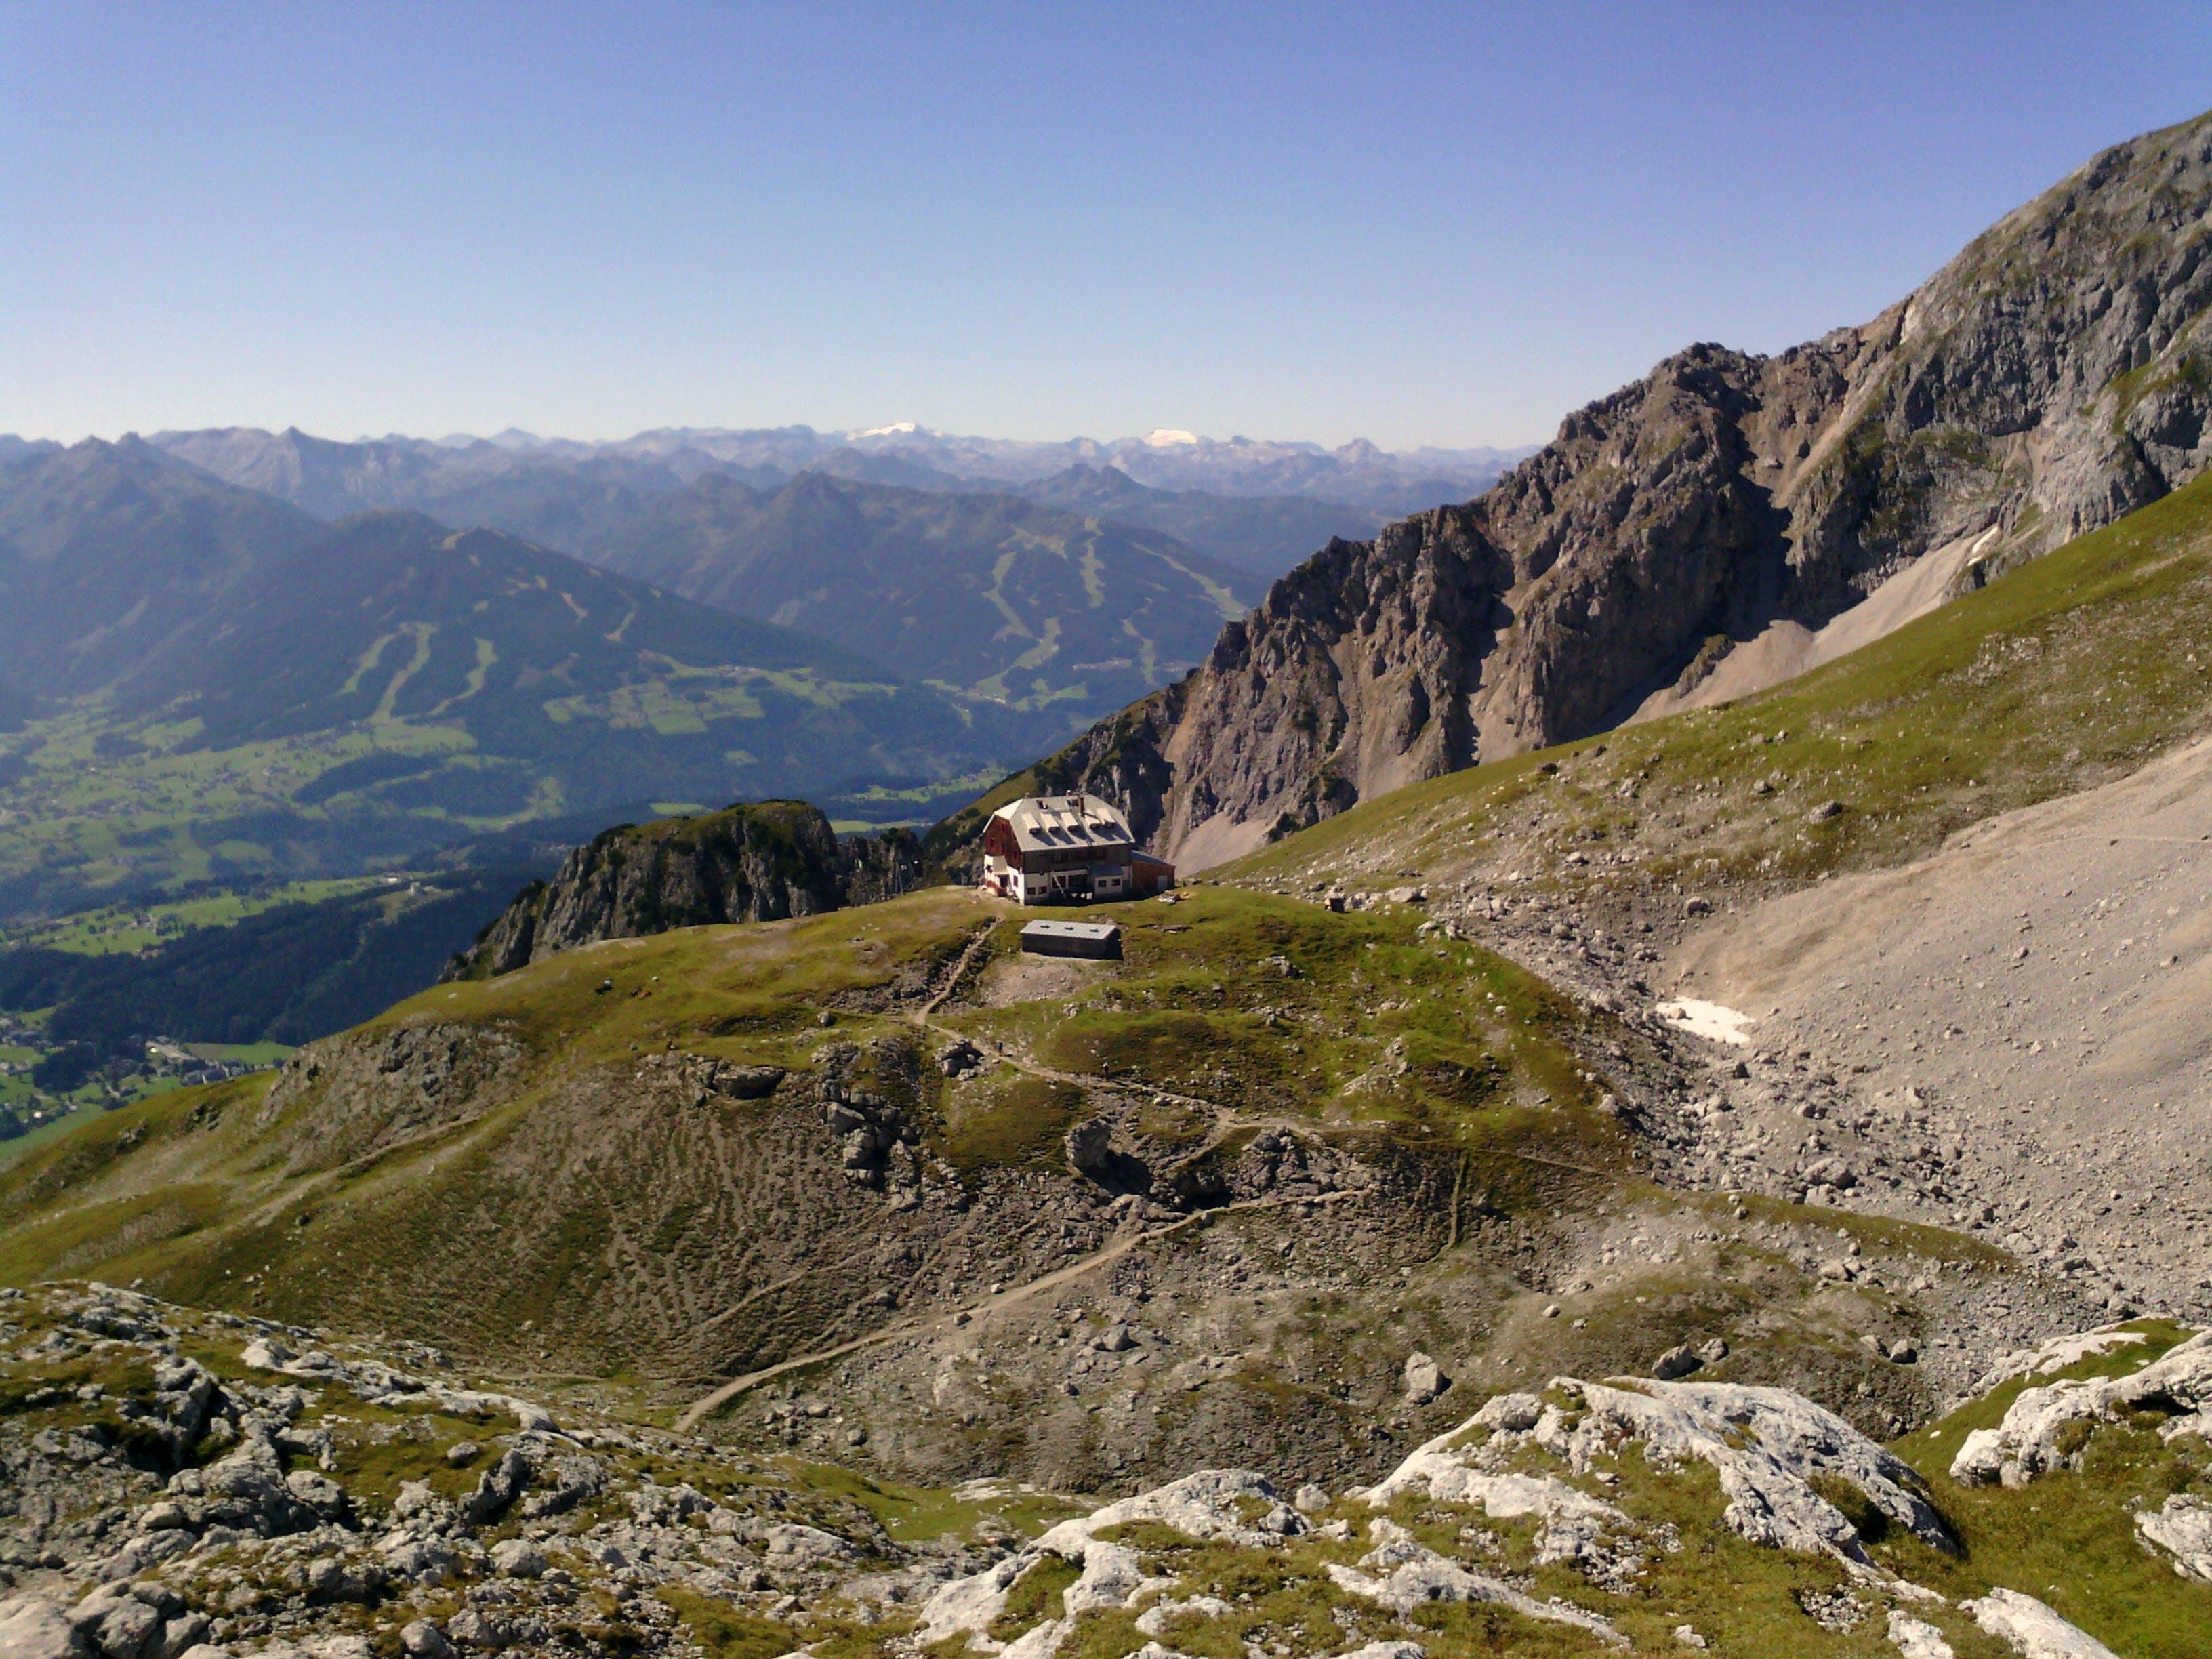 Free stock photo of mountains, hill, mountain, hiking